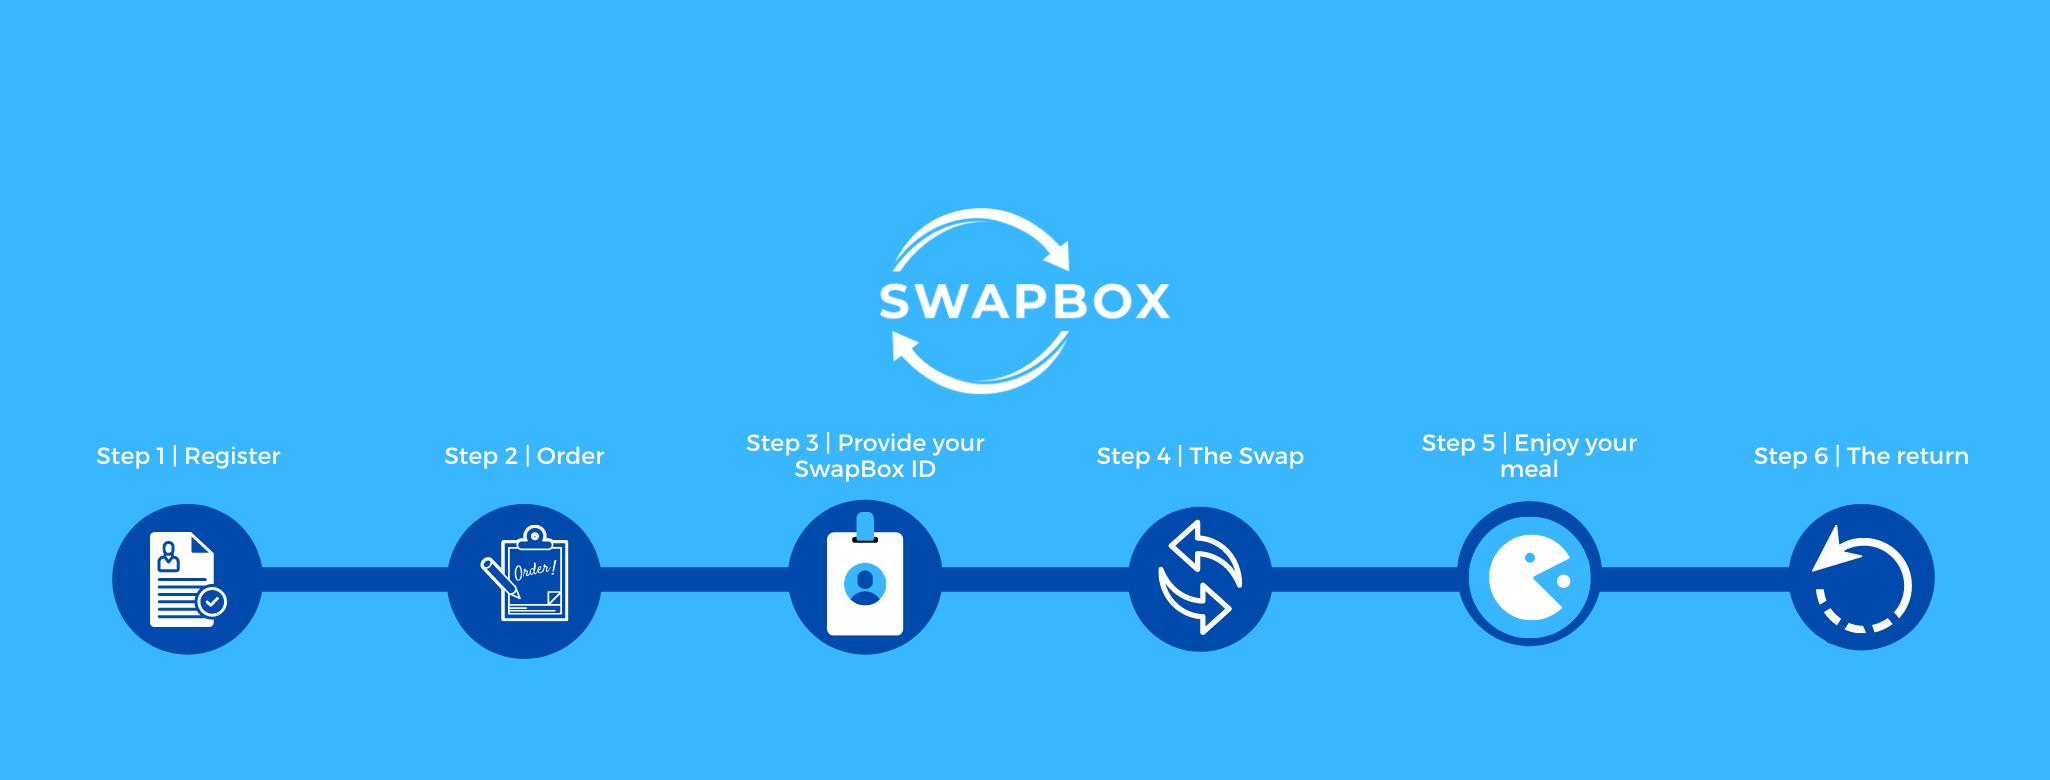 Swapbox x Meet My Job